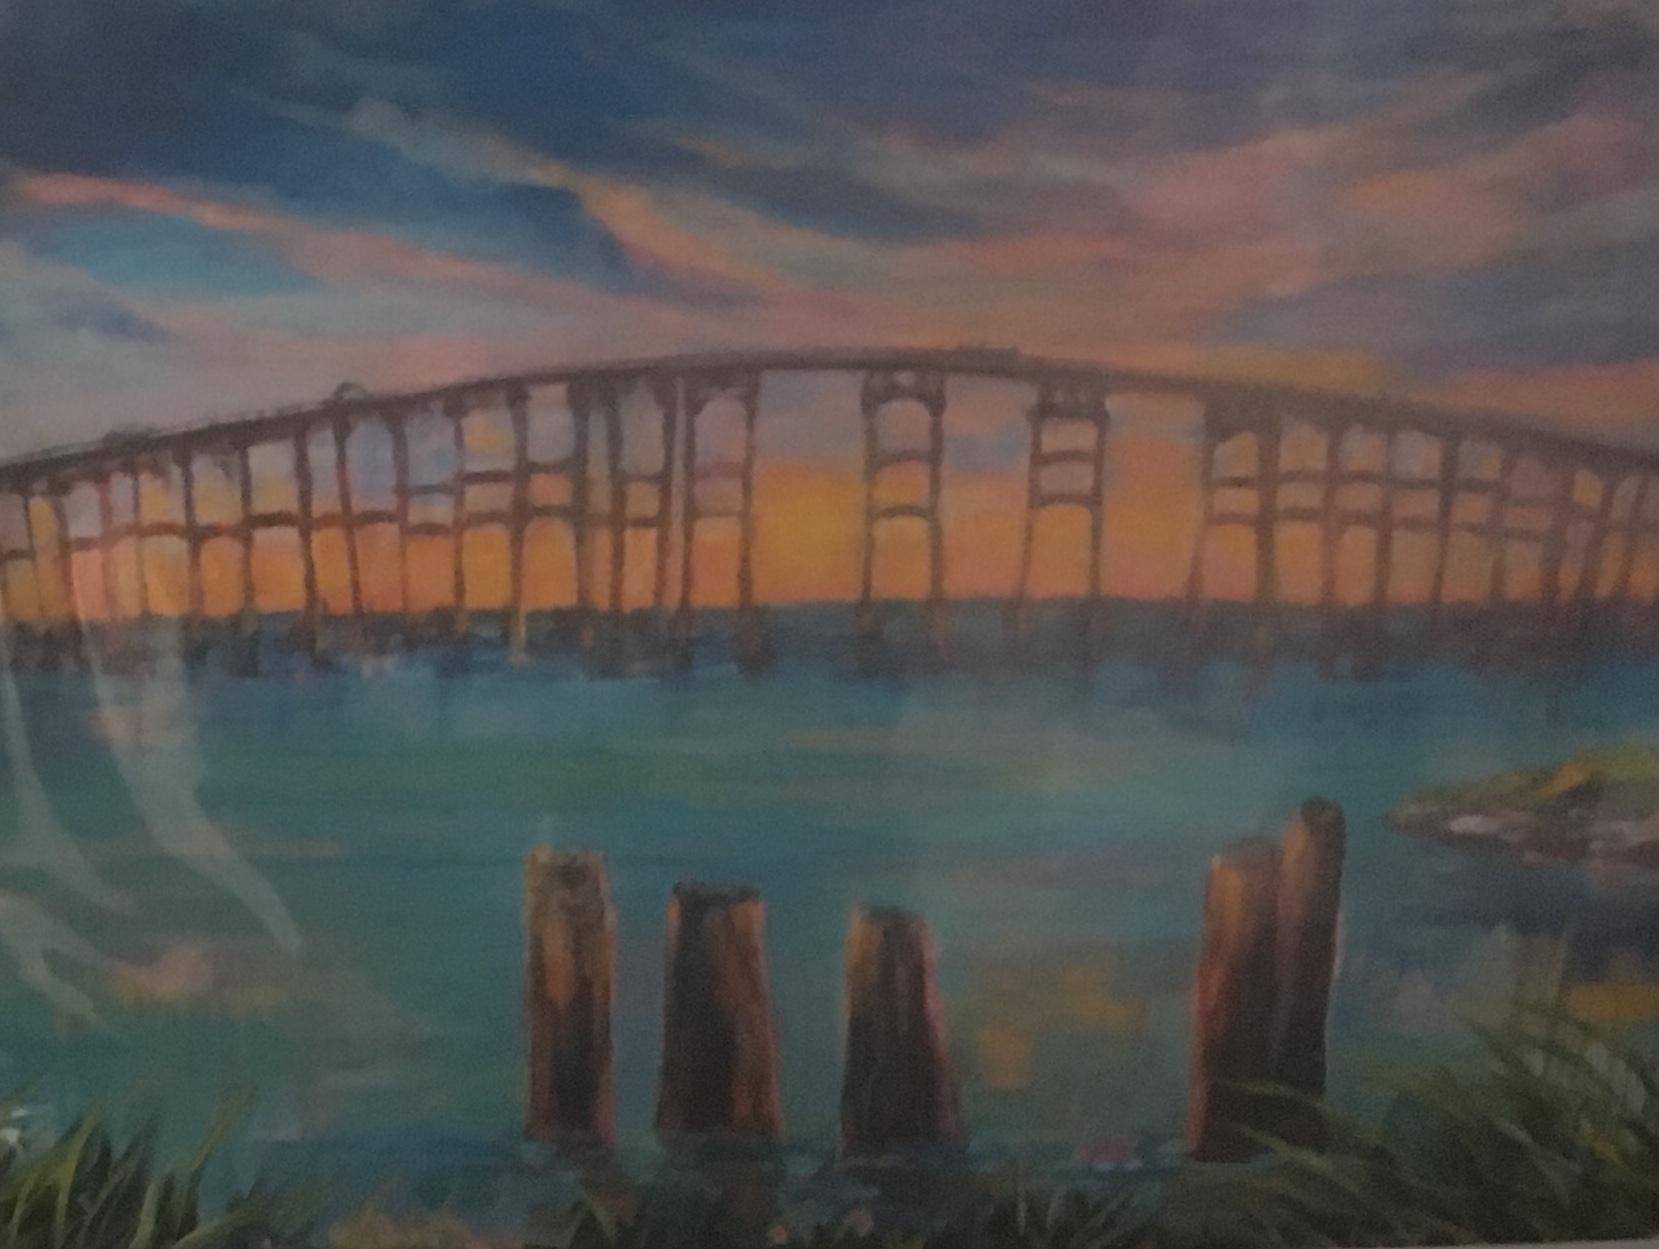 Bridge, 11 x 14, Print, $45